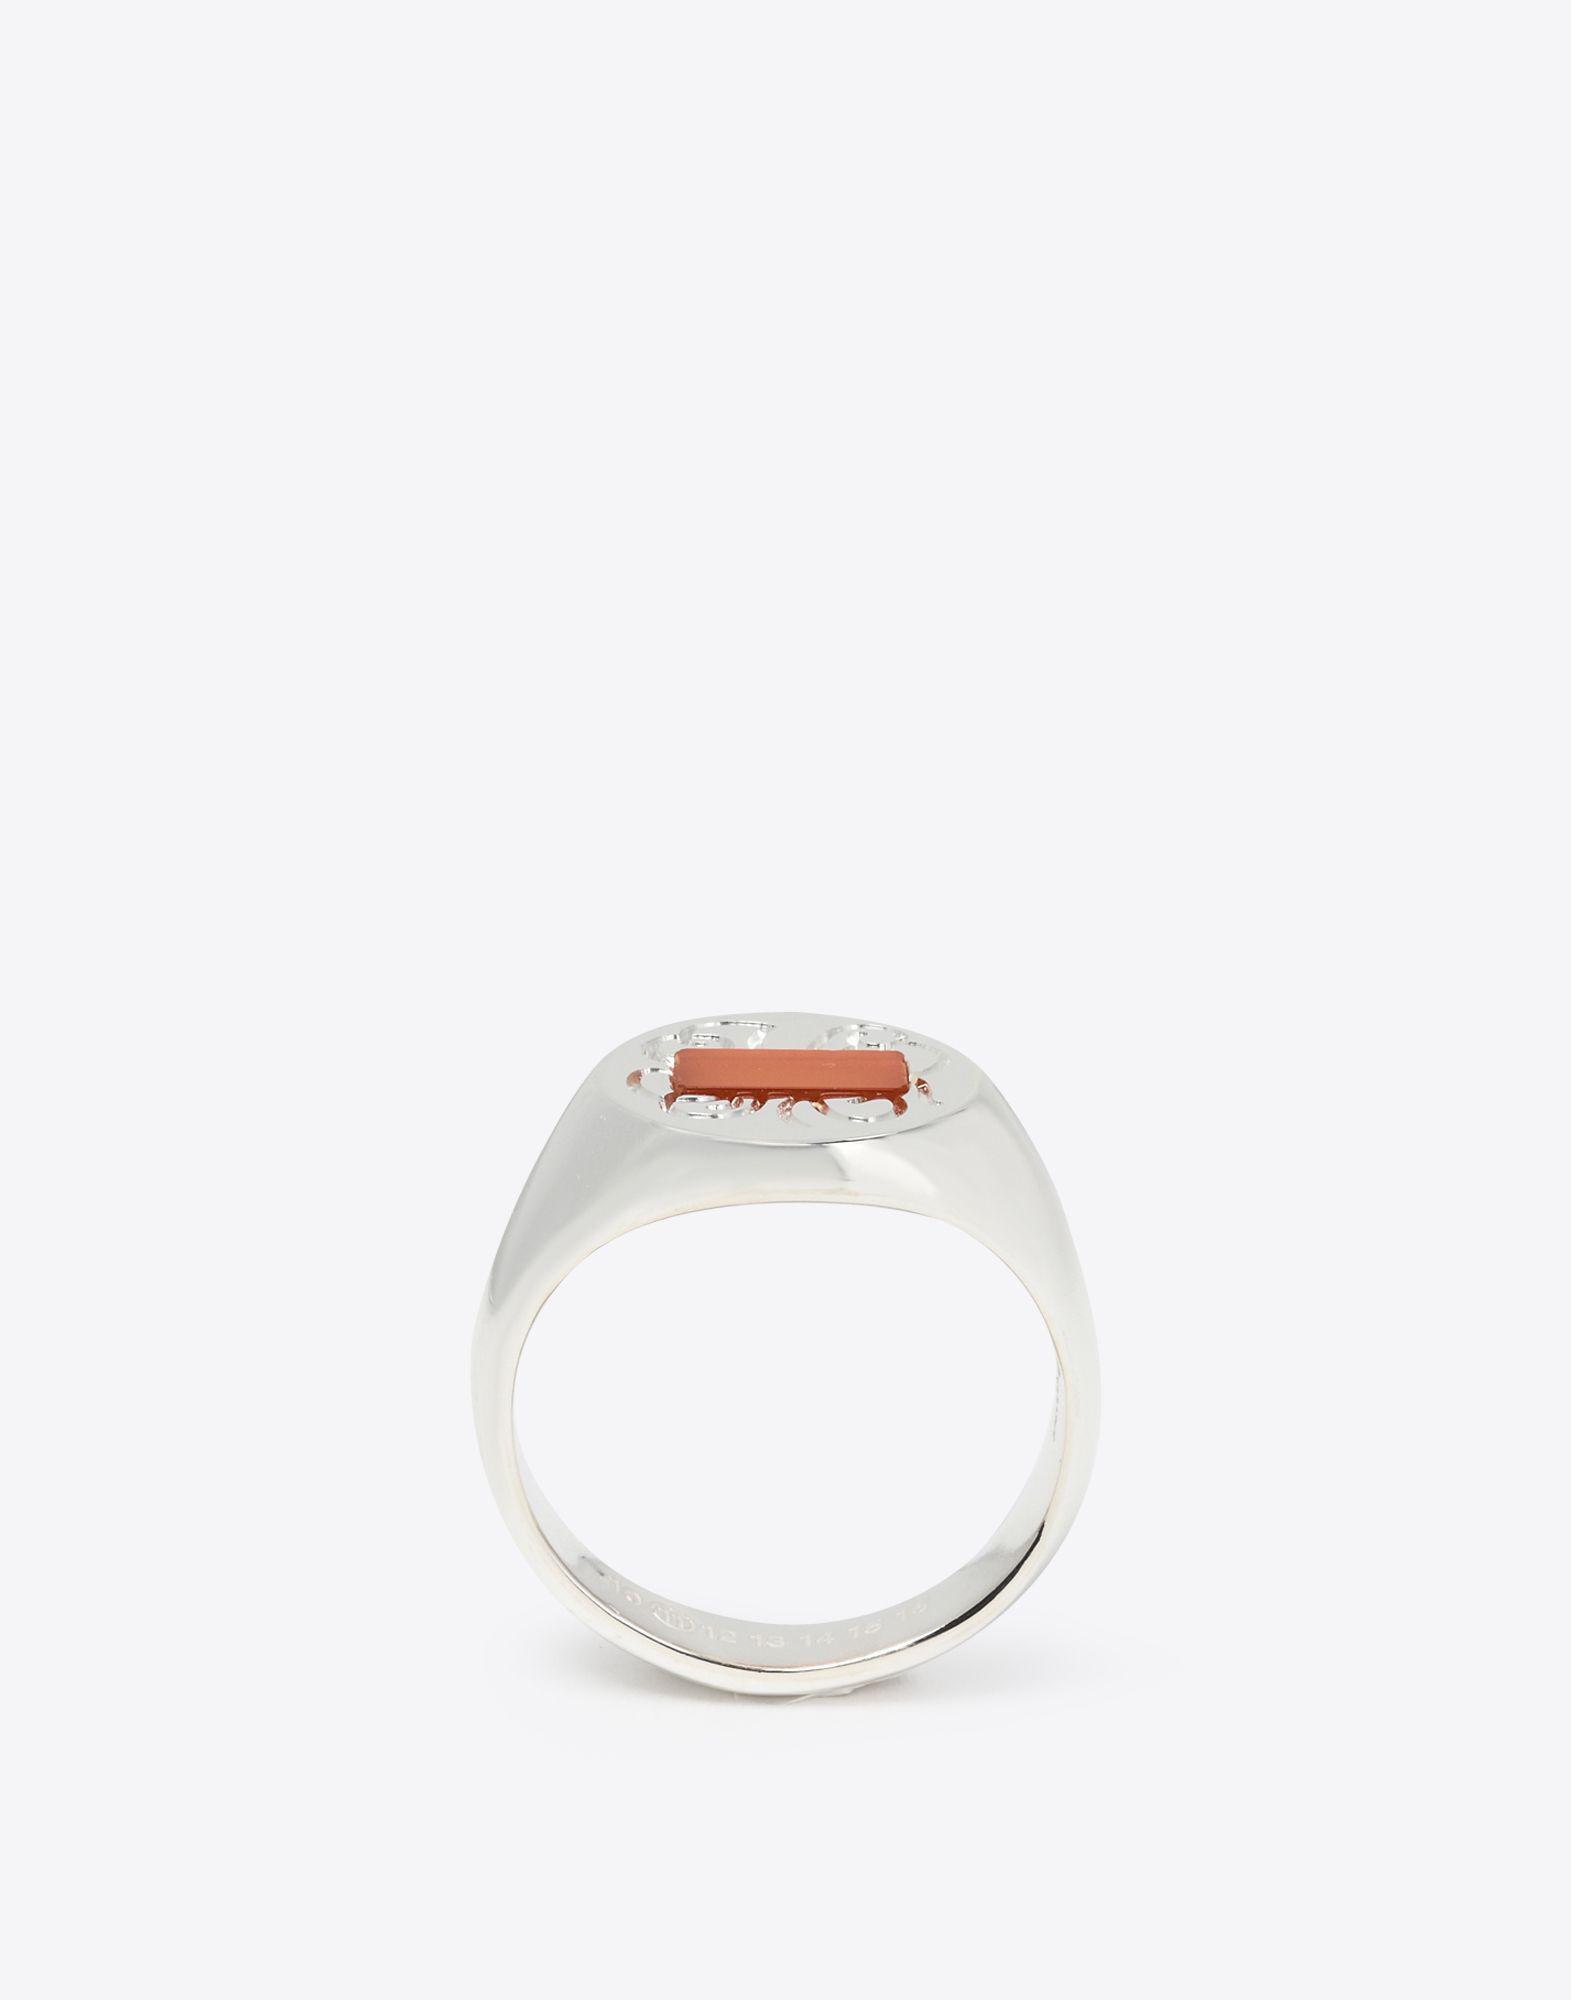 Classic Signet Ring - Metallic Maison Martin Margiela xE0y7